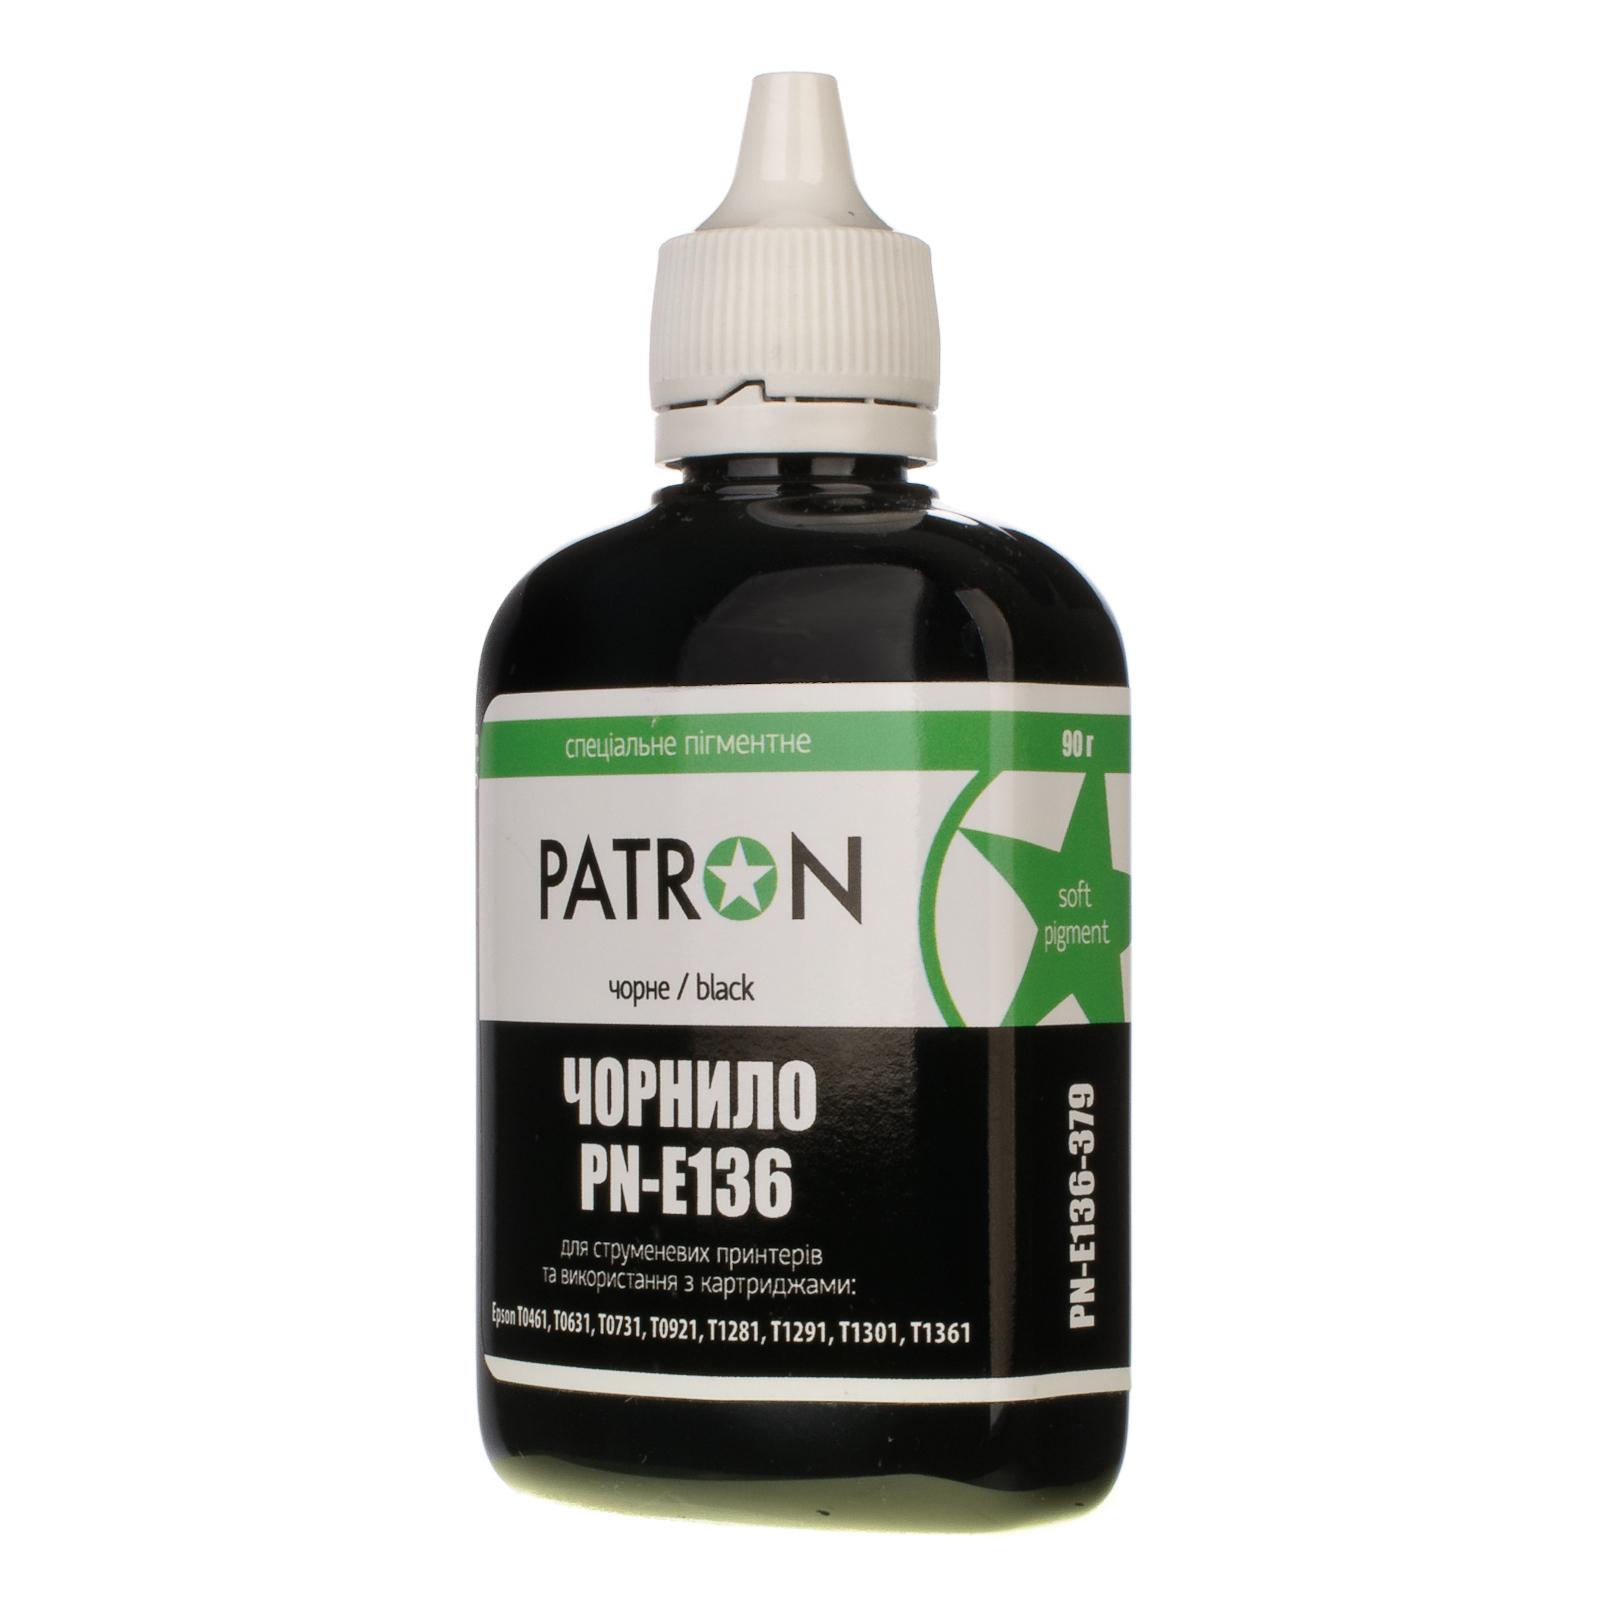 Чернила PATRON EPSON T1361(K101) BLACK SOFTpigment 90г (I-PN-ET136-090-B-SP)